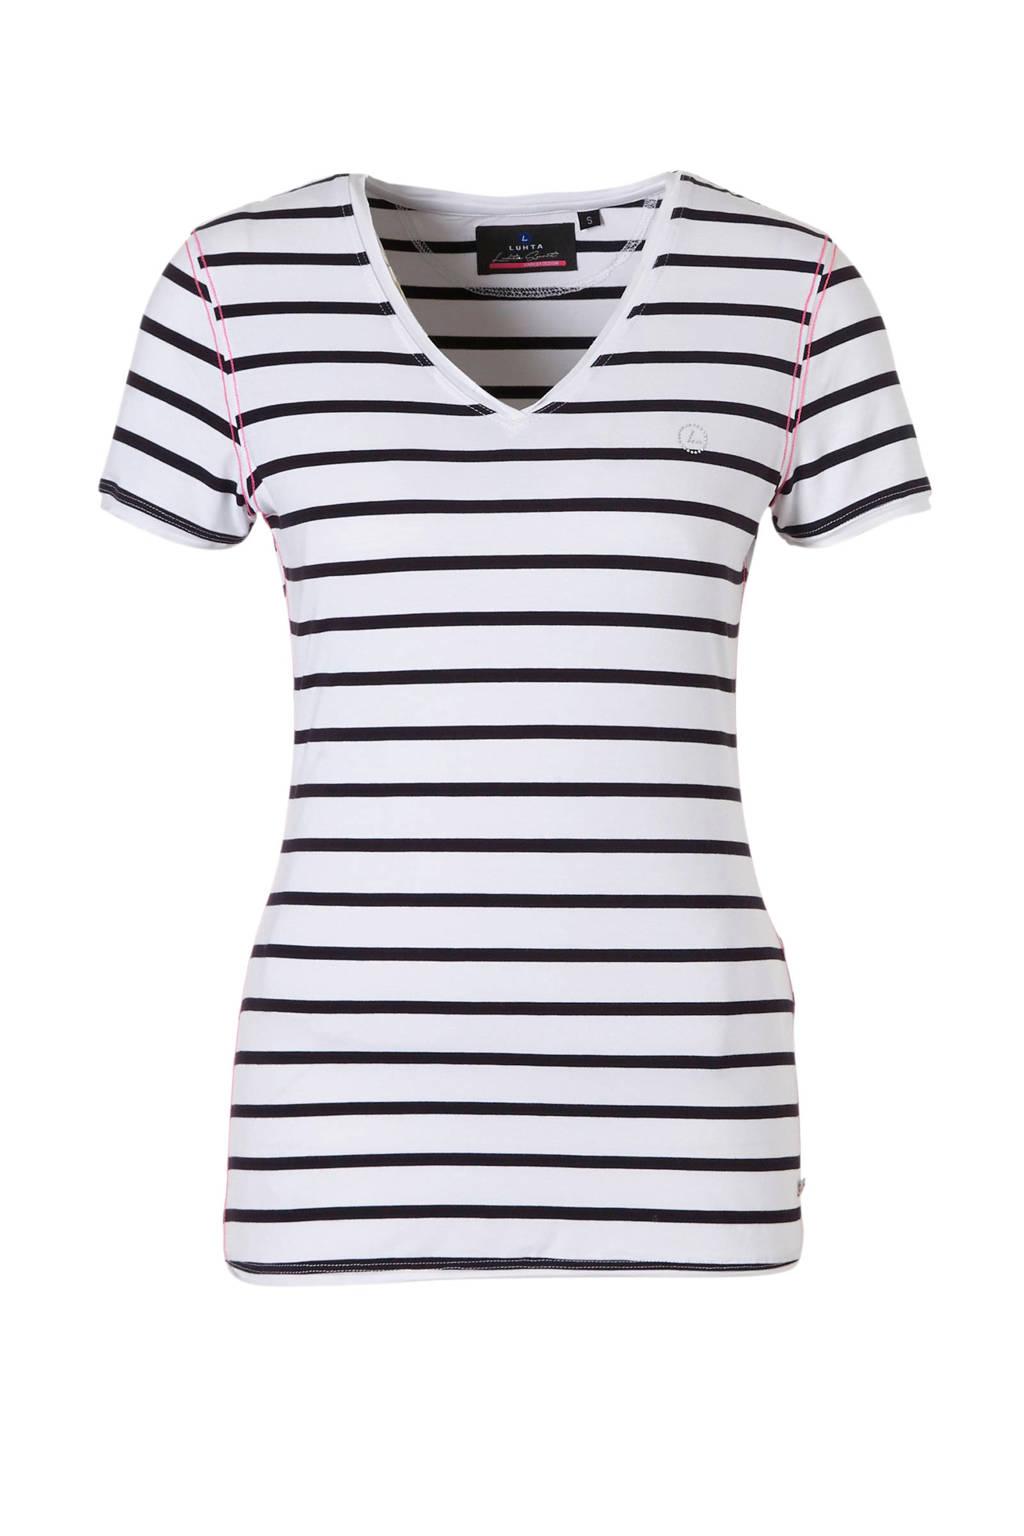 Luhta T-shirt, Wit/donkerblauw